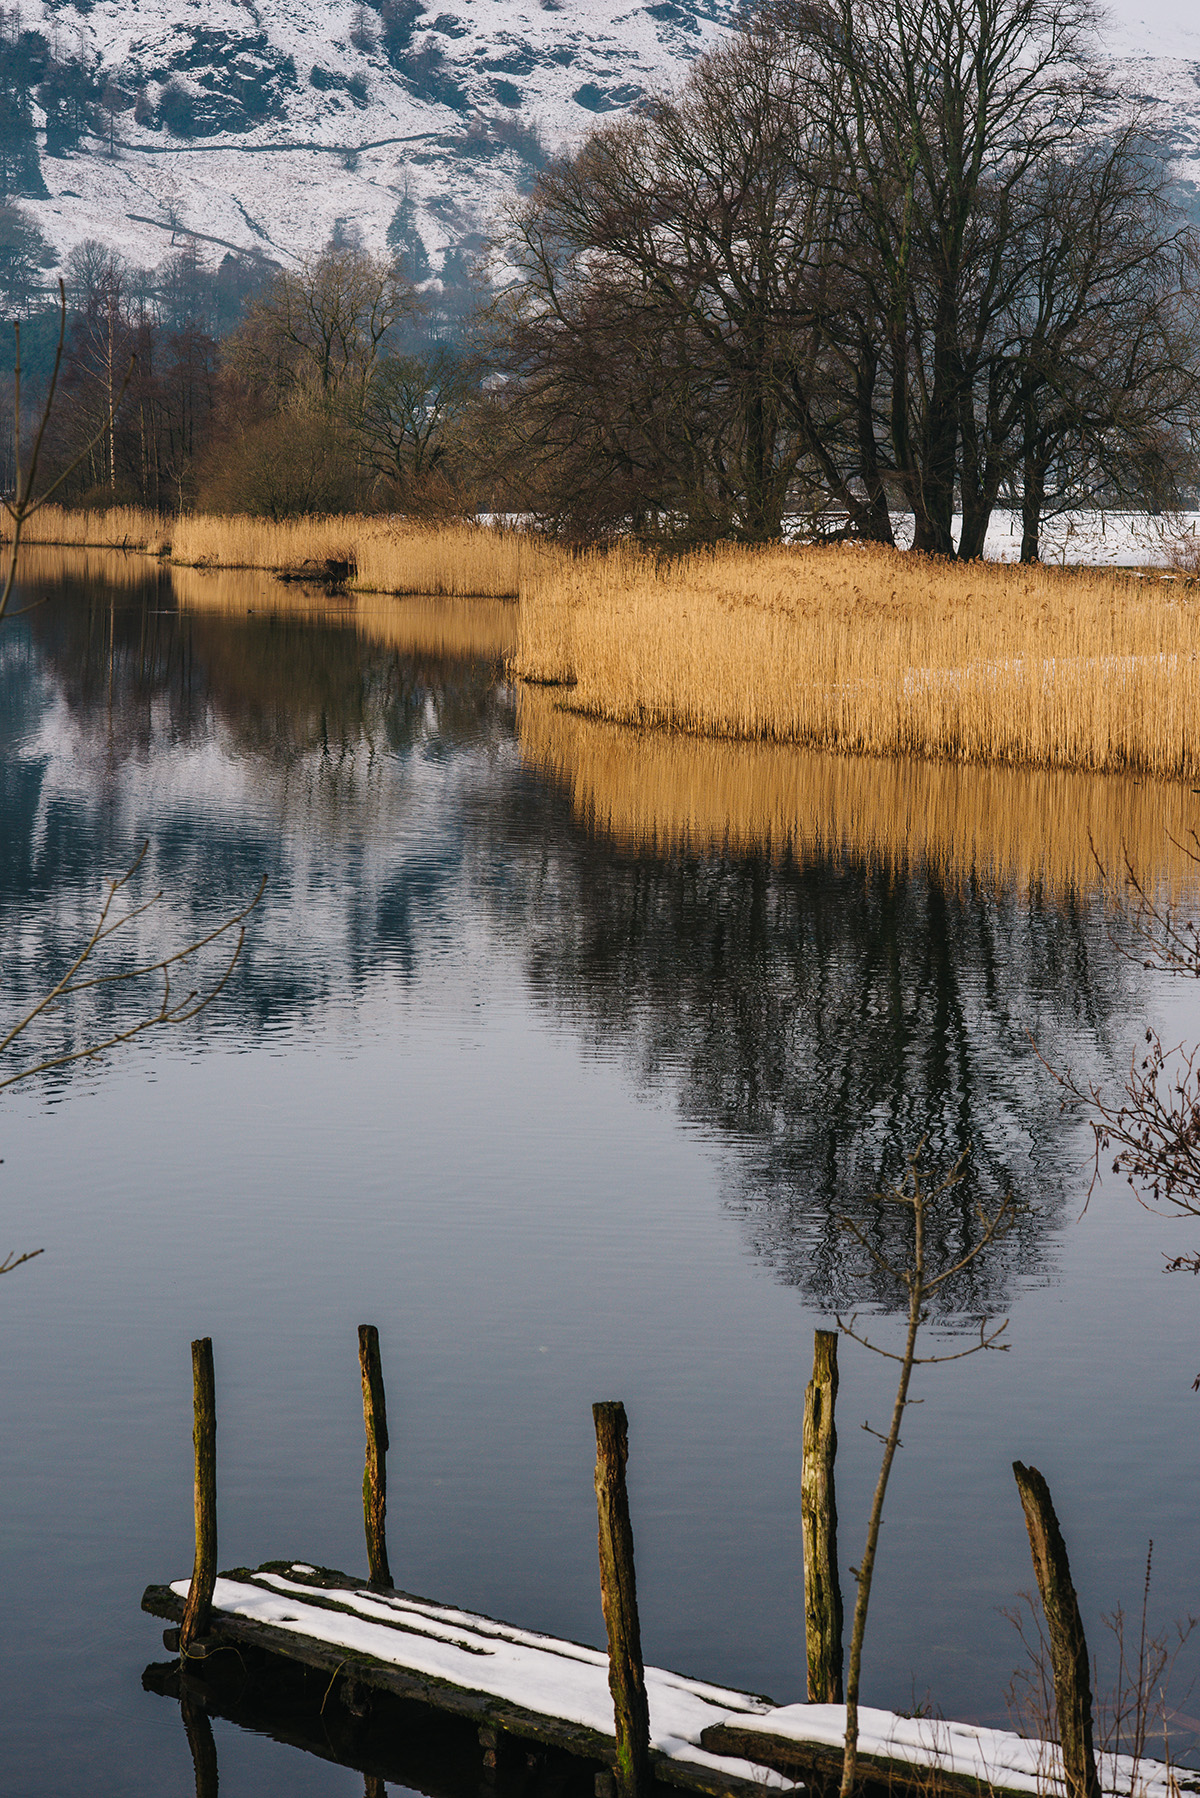 Lake Windermere reeds and lake